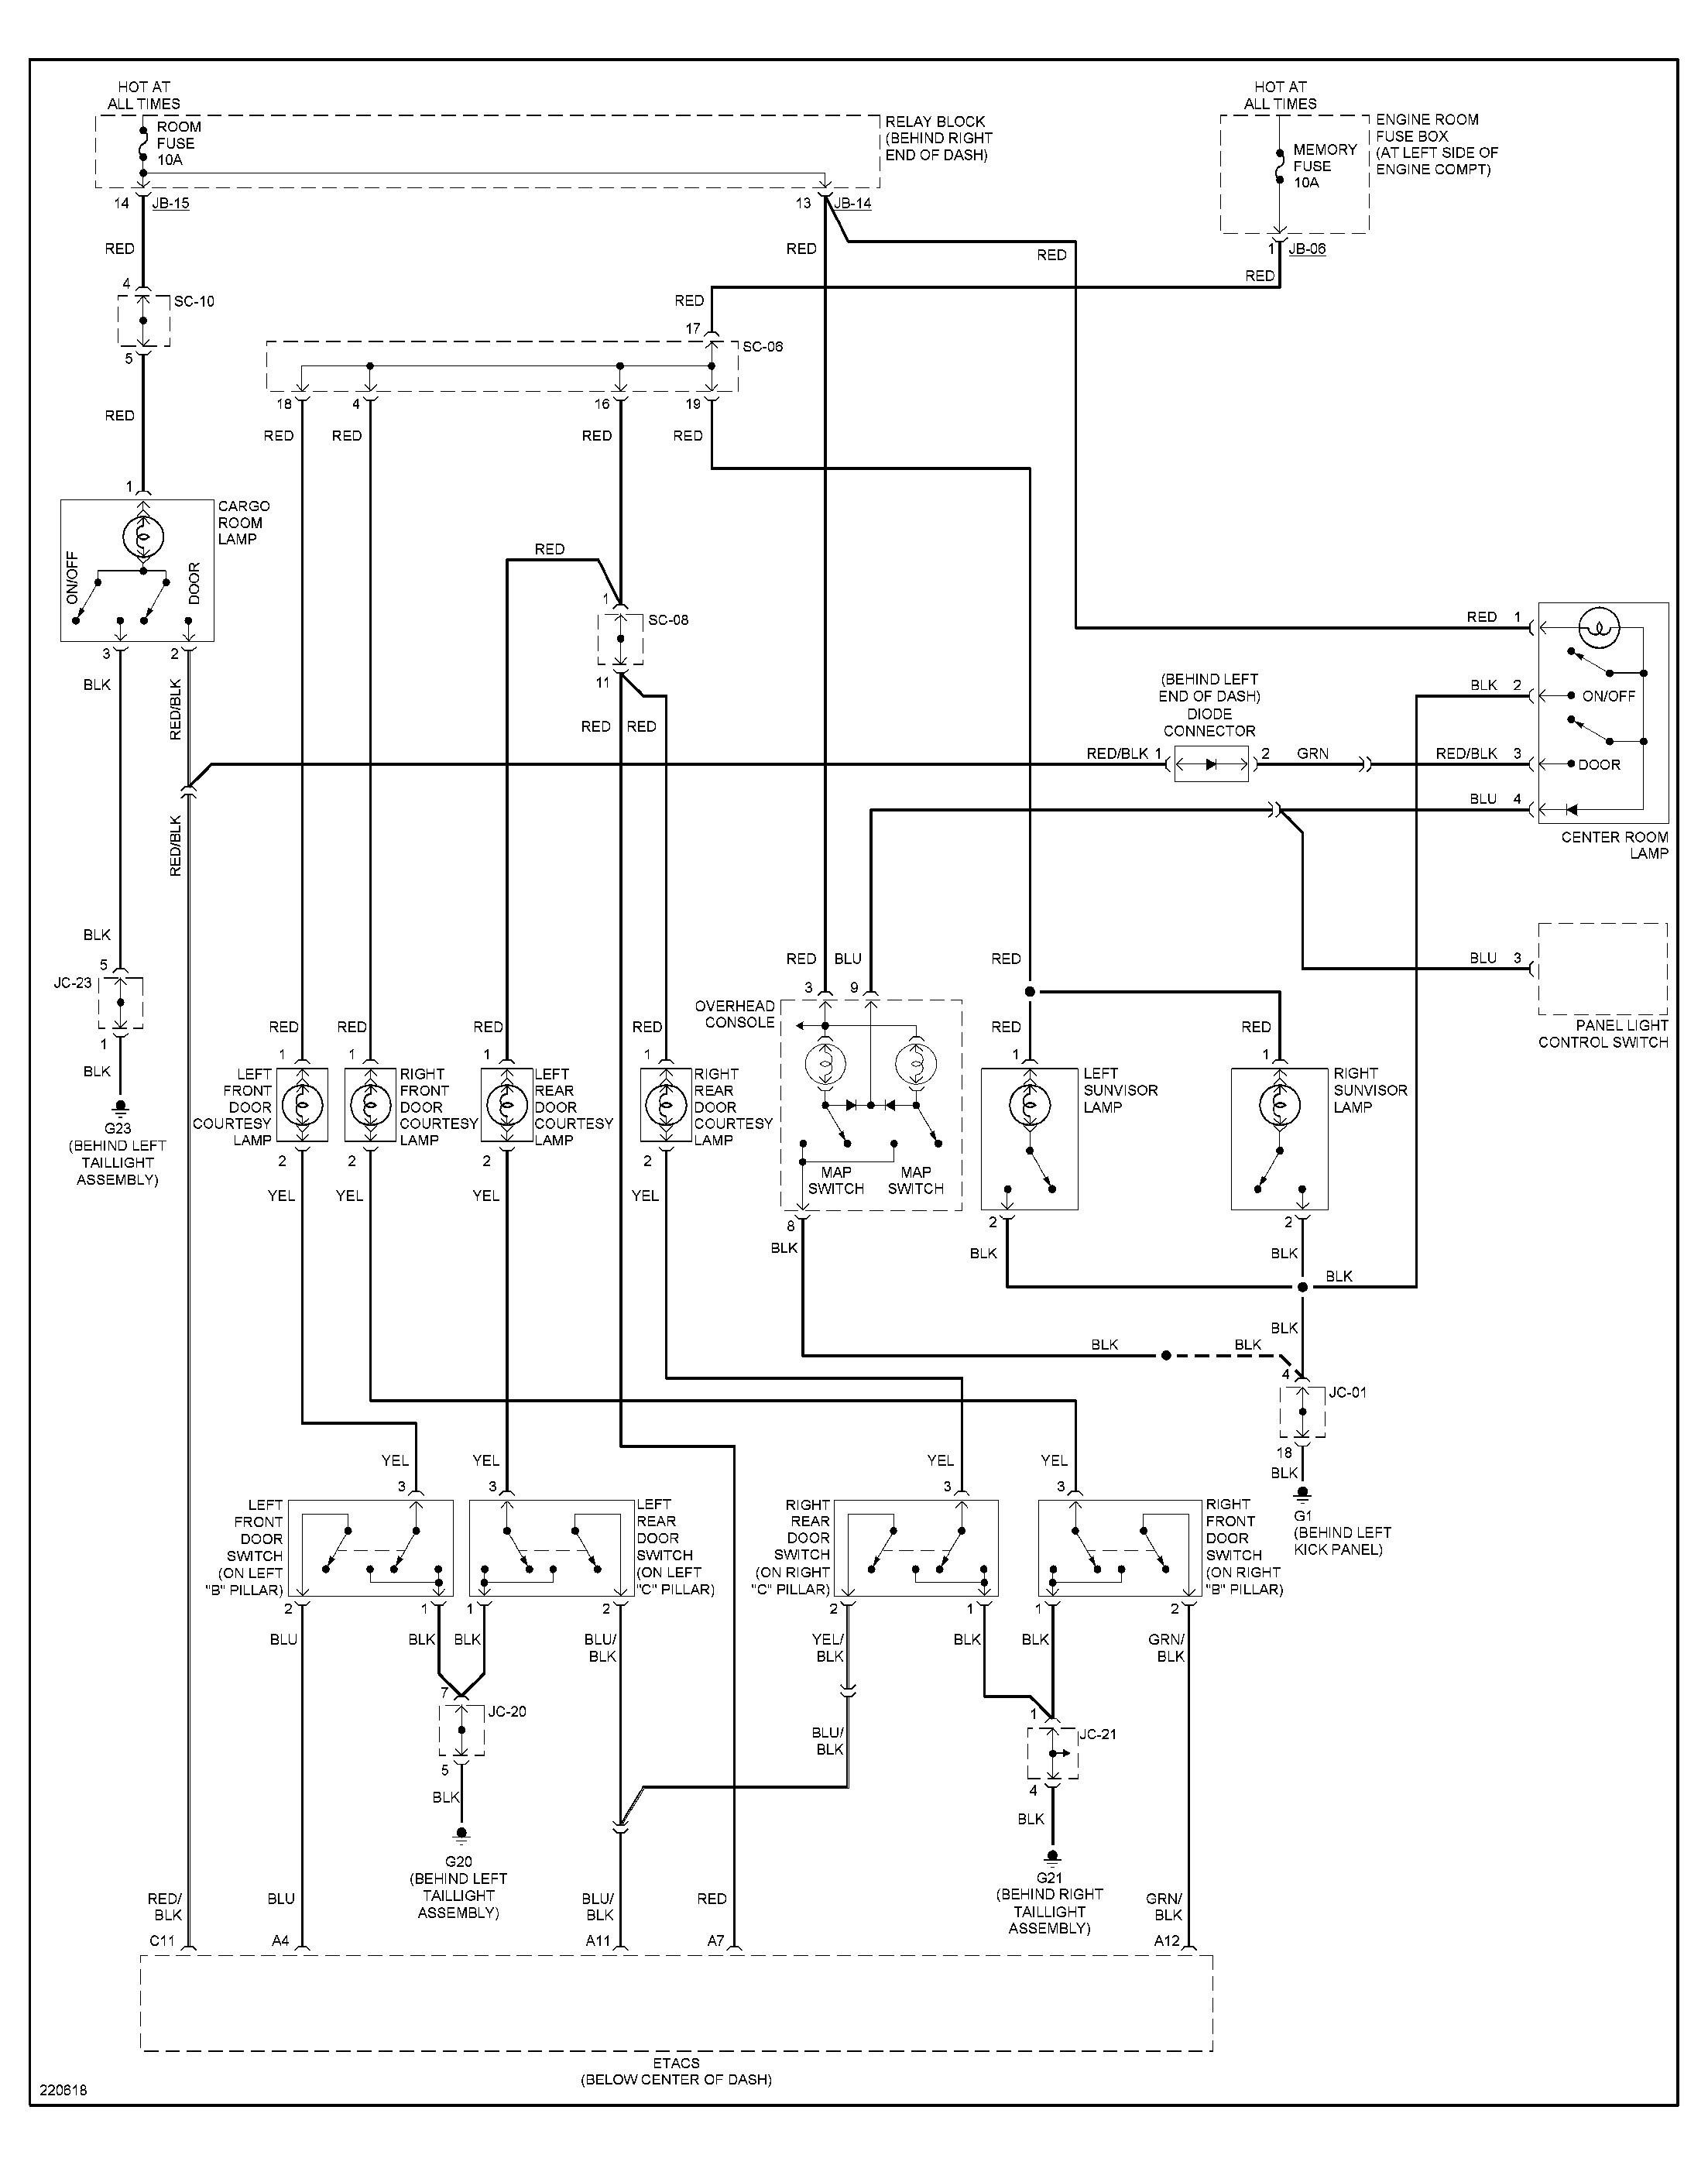 2008 Malibu Starter Circuit Schematic Diagram] Kia Rio Engine Wiring Diagram Full Version Hd Of 2008 Malibu Starter Circuit Schematic